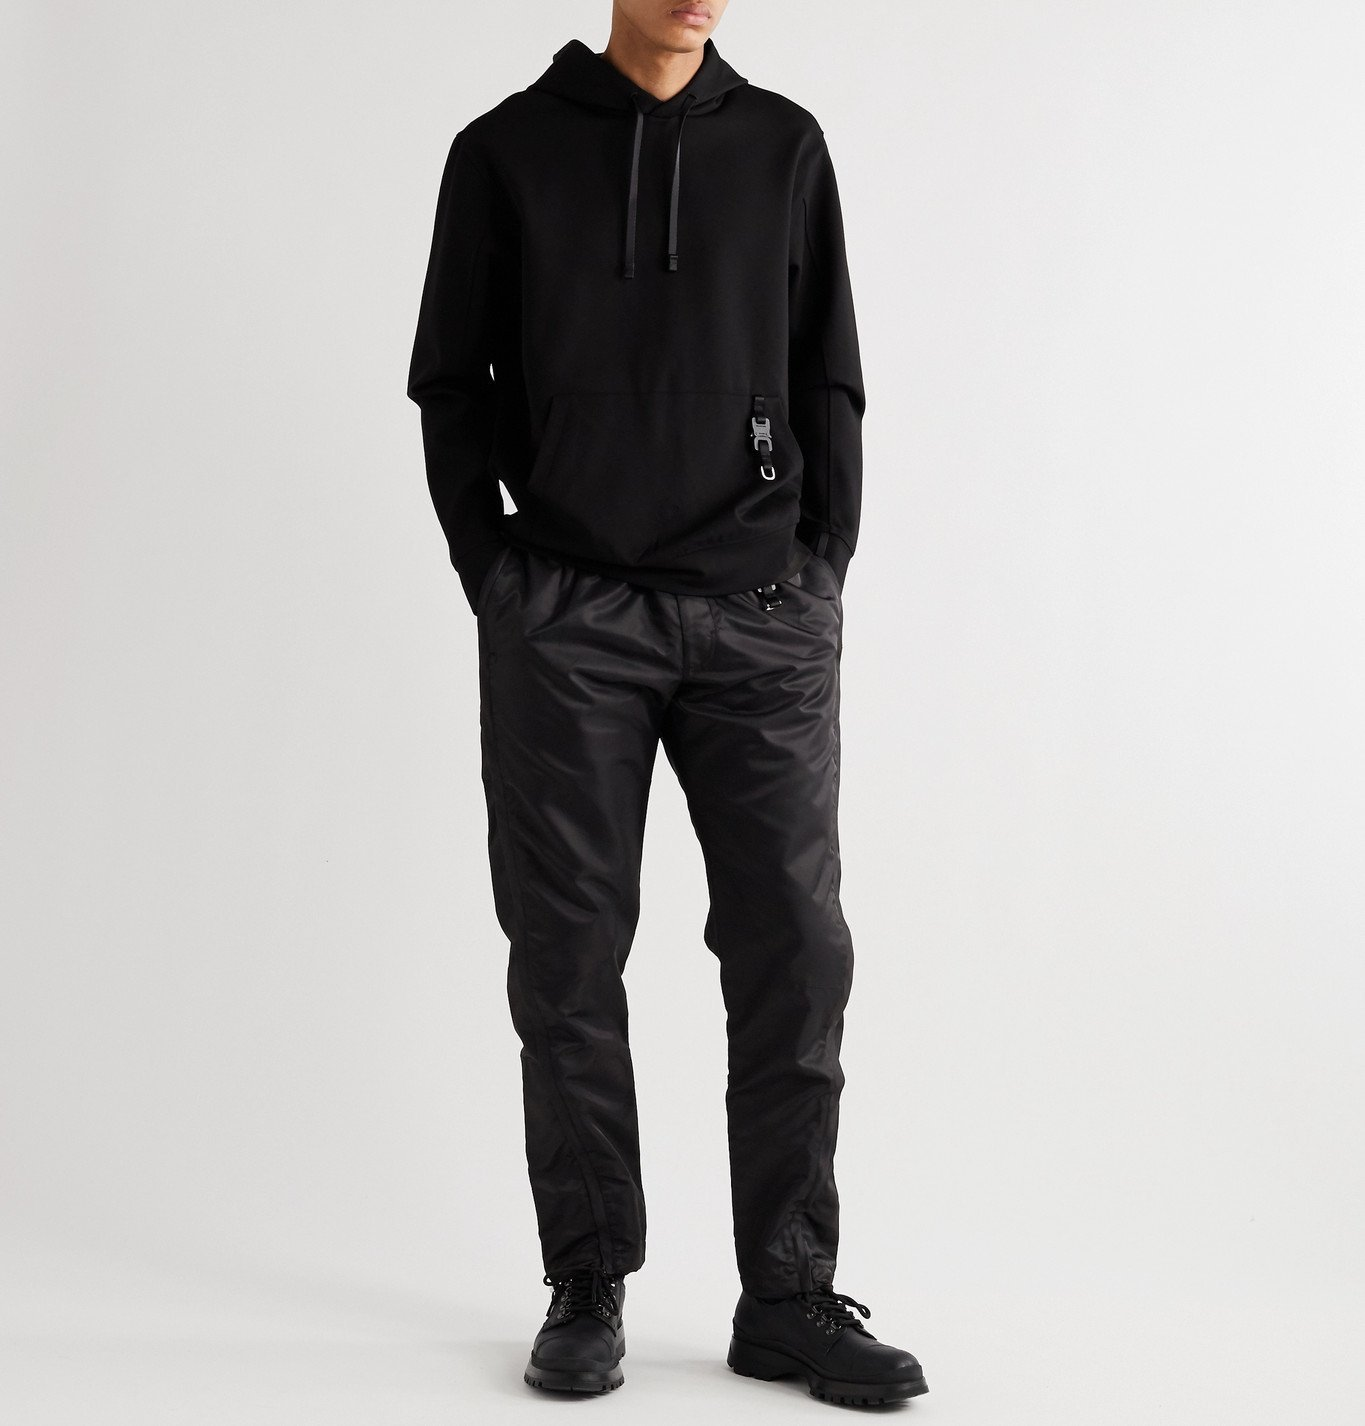 1017 ALYX 9SM - Slim-Fit Buckle-Detailed Nylon Sweatpants - Black